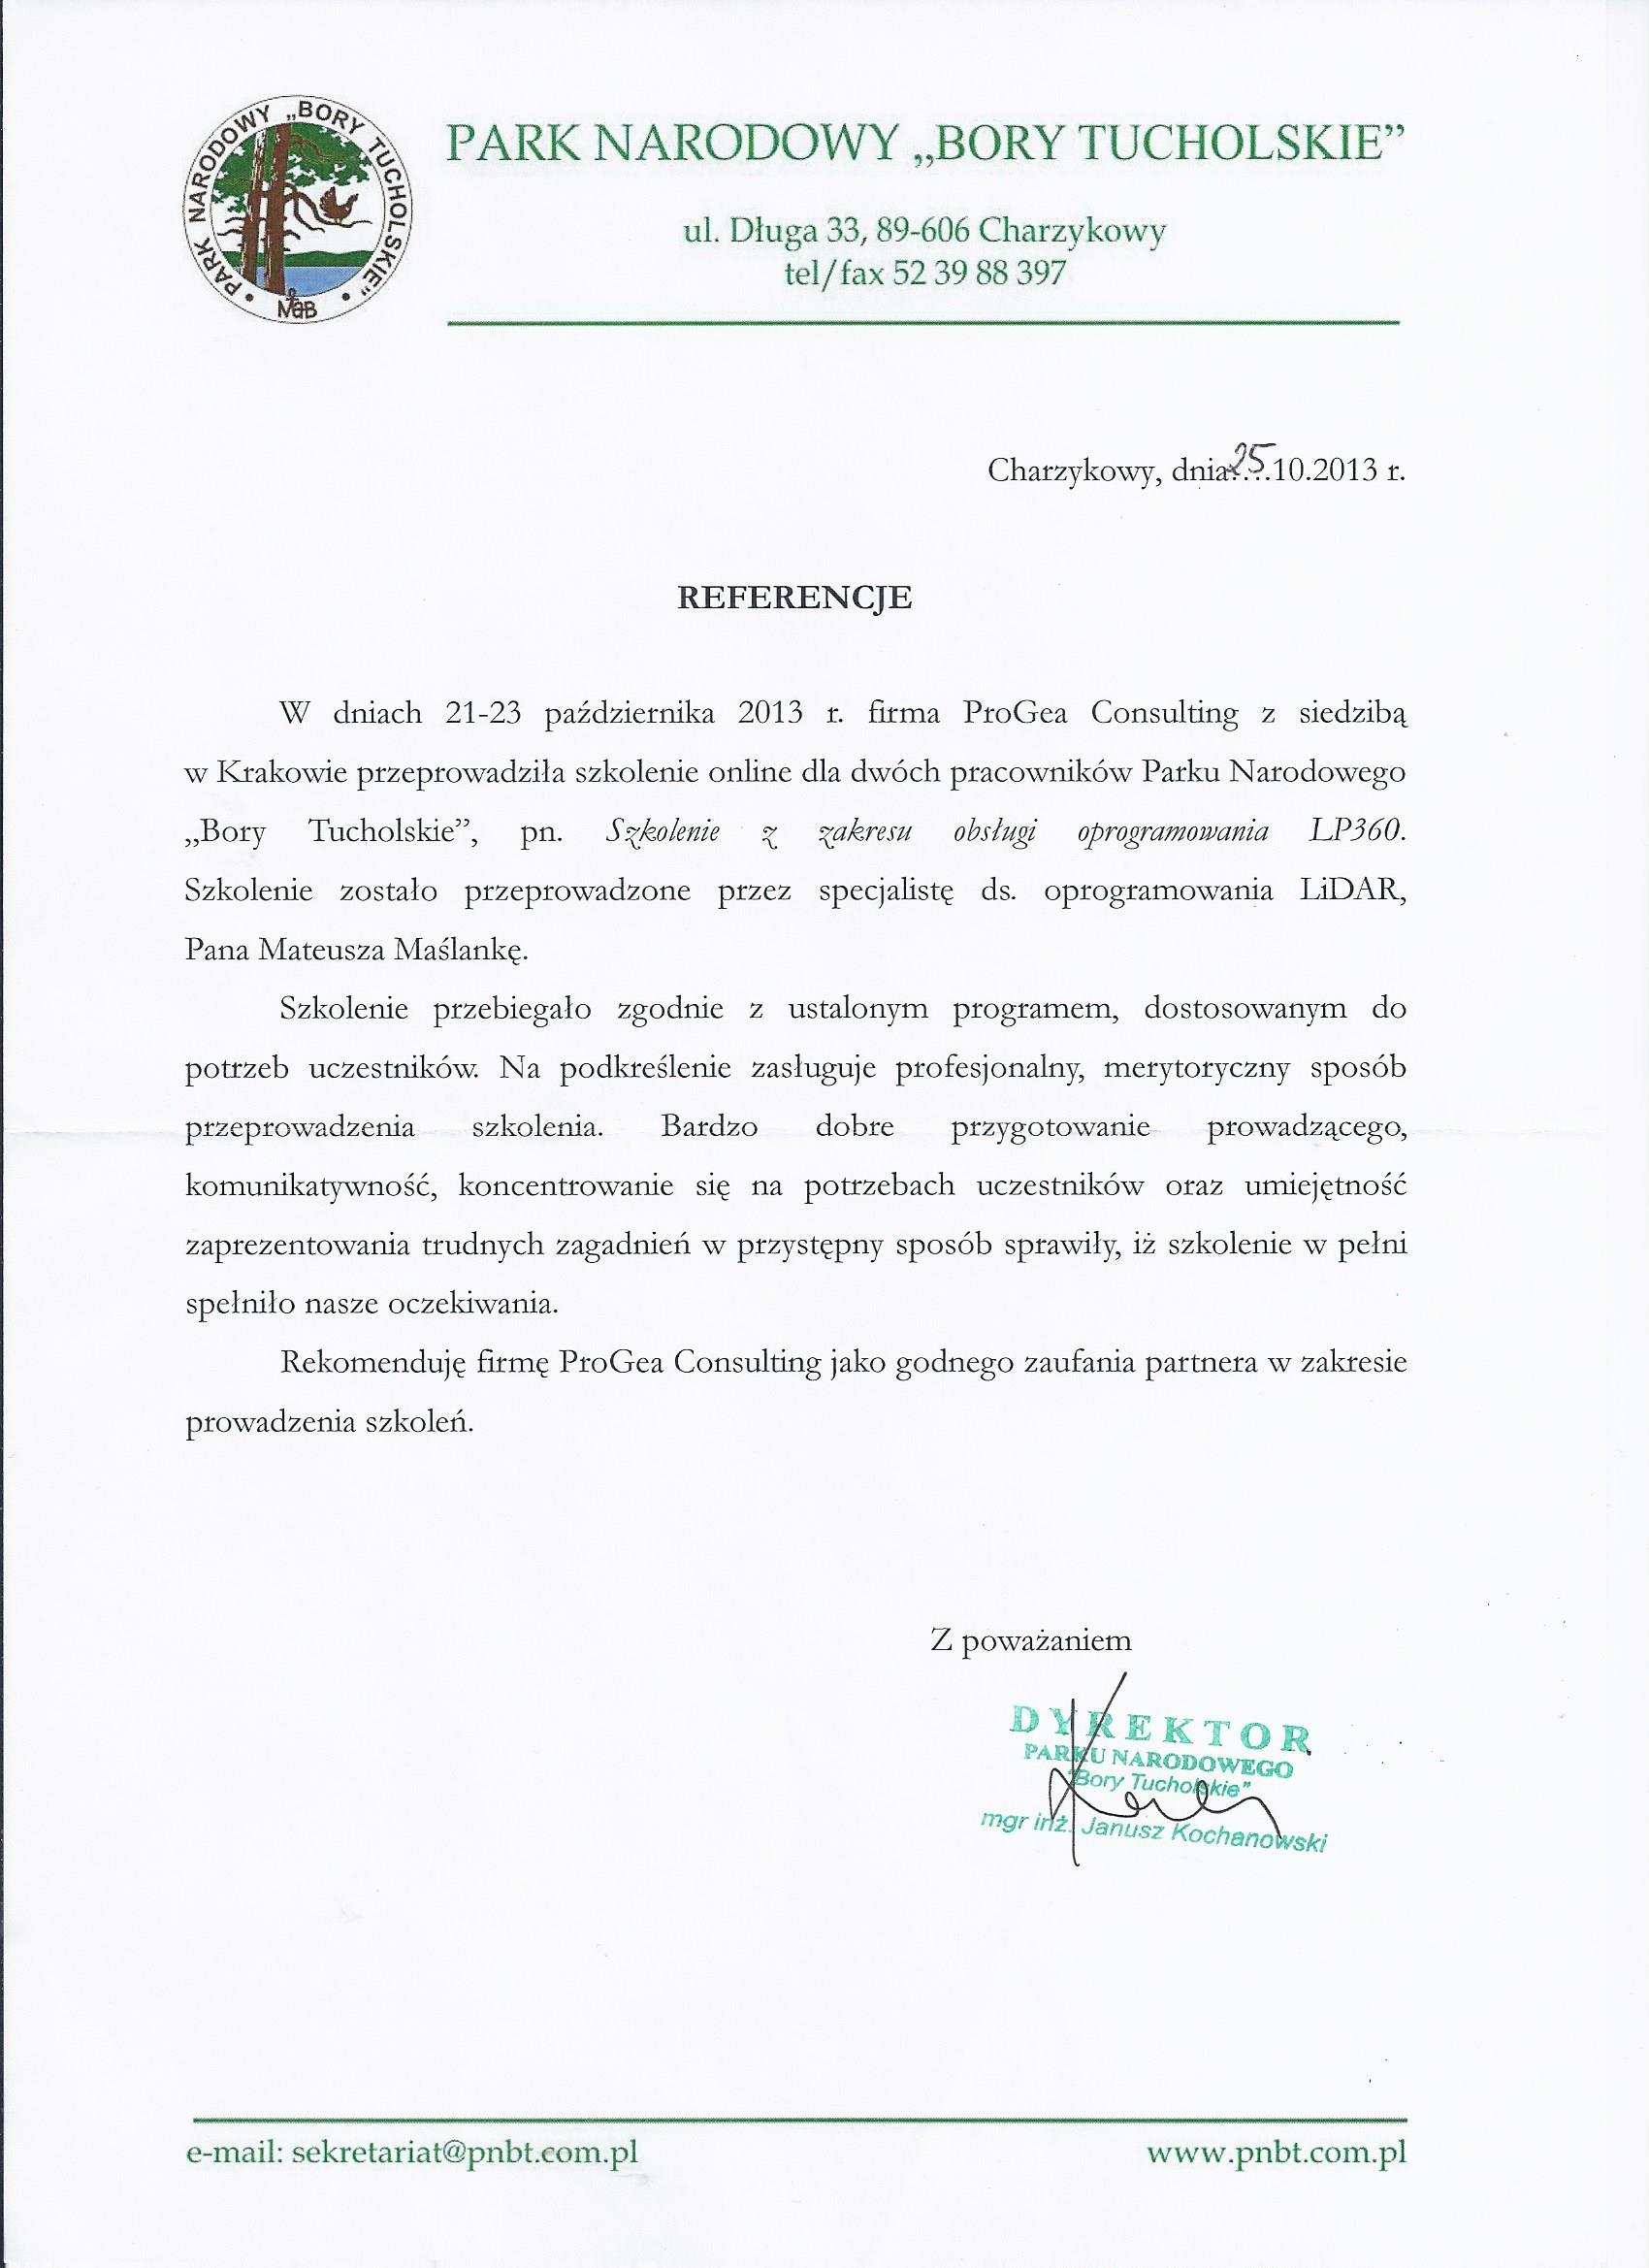 referencje_Bory Tucholskie